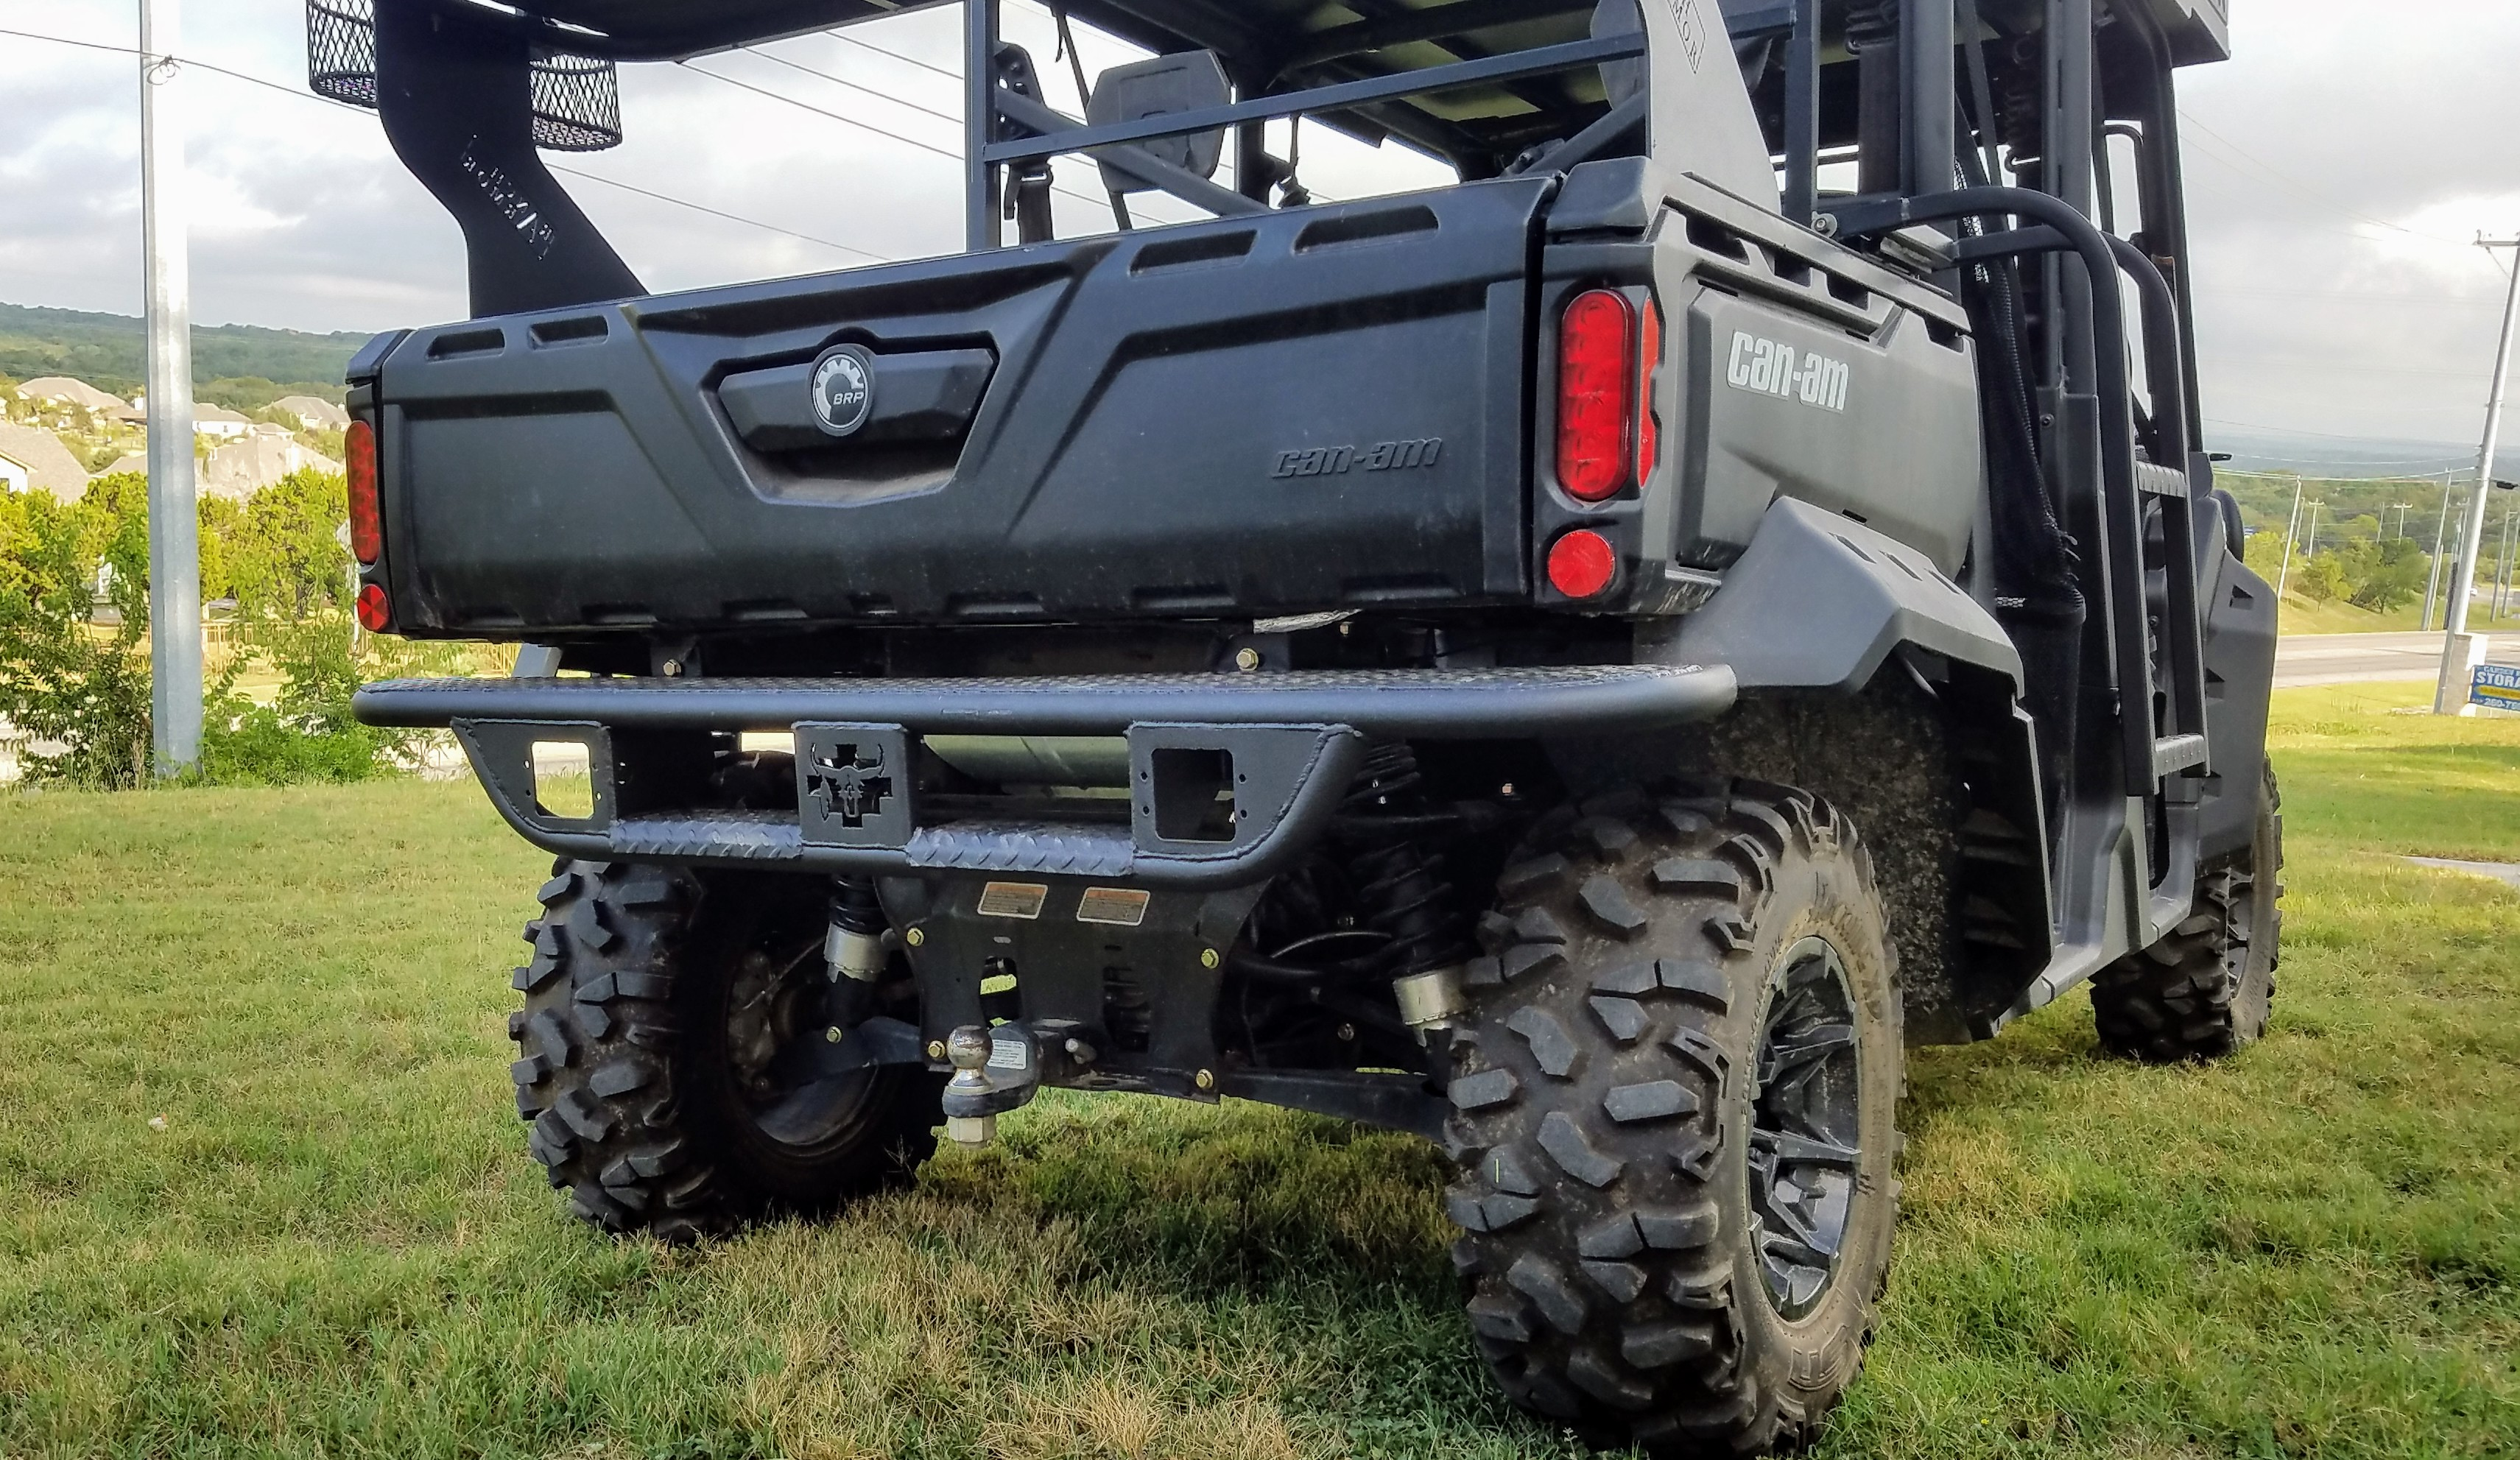 can-am-defender-rear-bumper-tough-country-pipe-utv.jpg